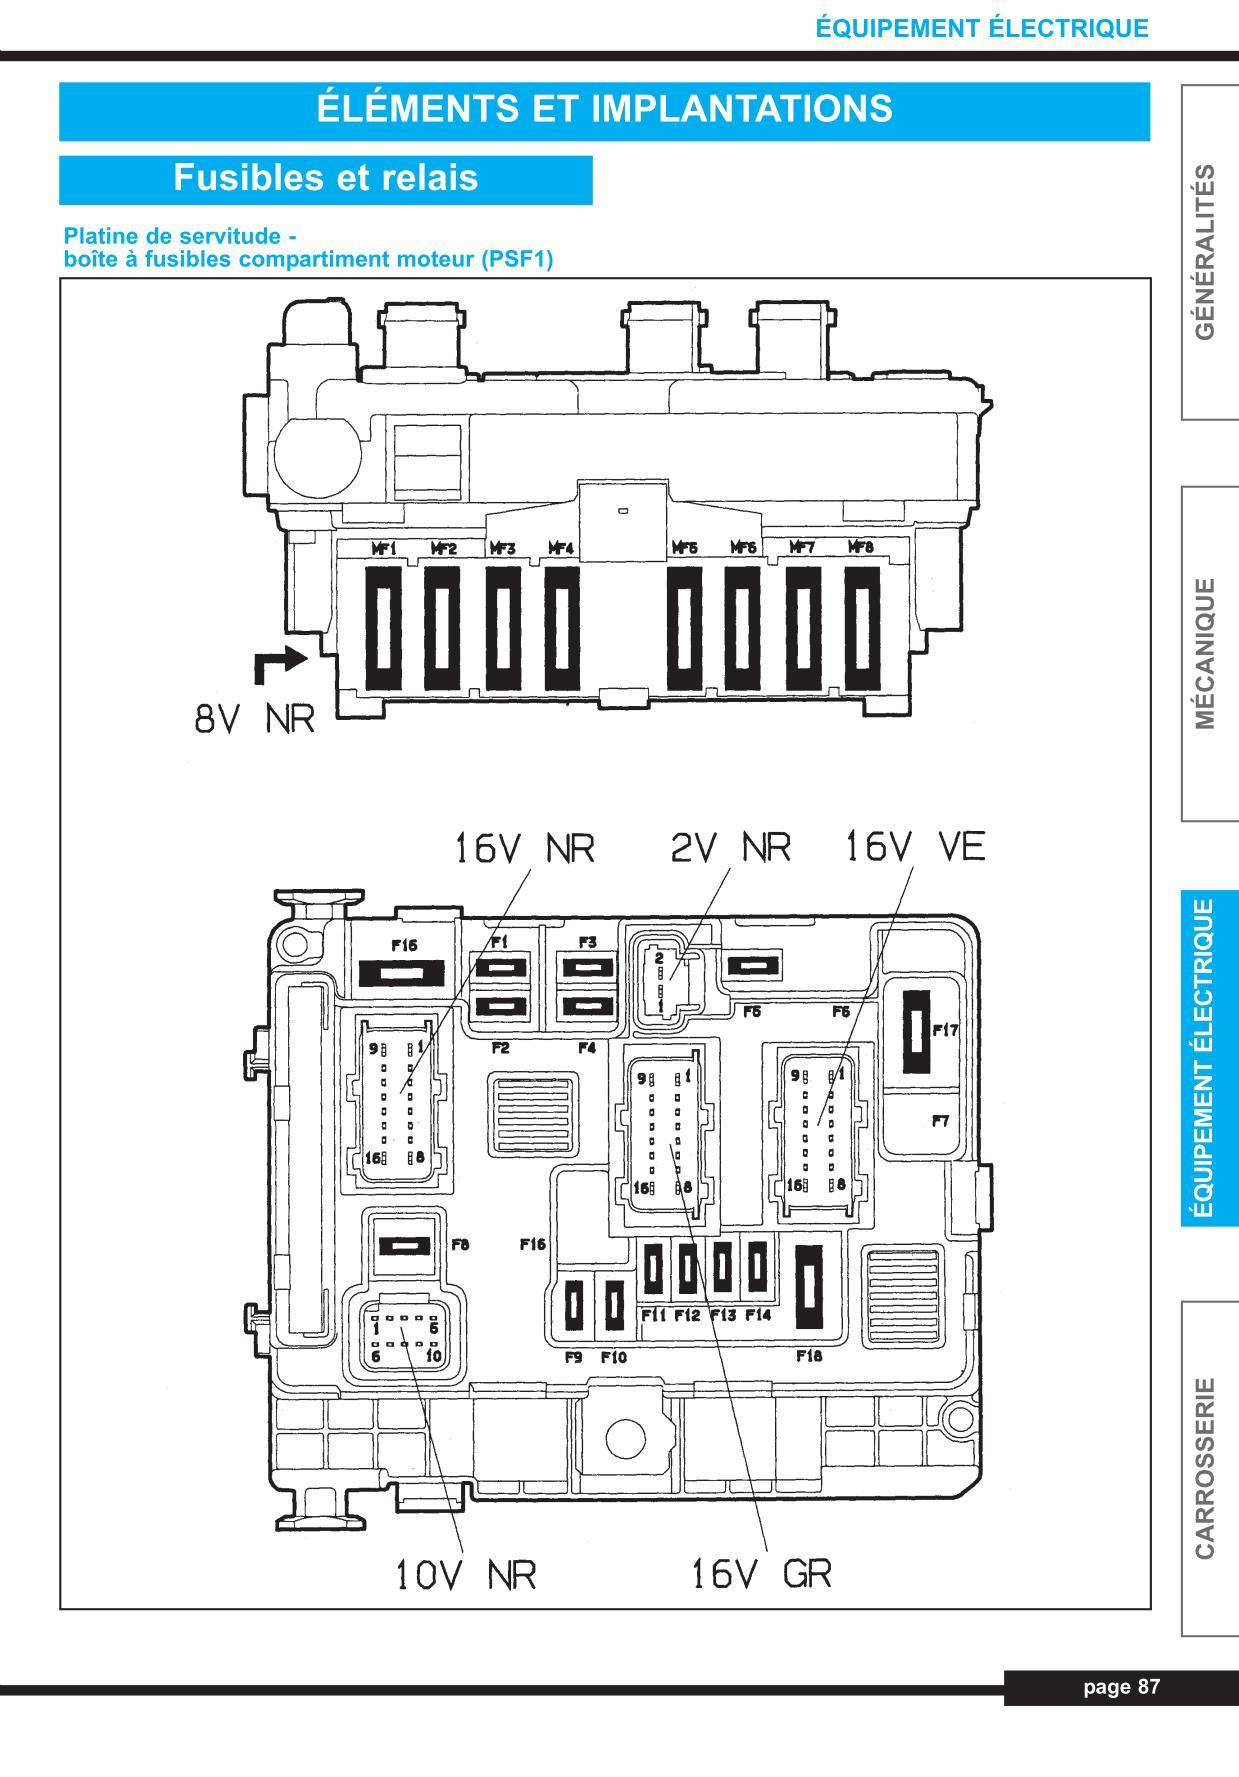 Citroen Fuel Pump Diagram - wiring diagram electron-total -  electron-total.hoteloctavia.it   Citroen Fuel Pump Diagram      hoteloctavia.it